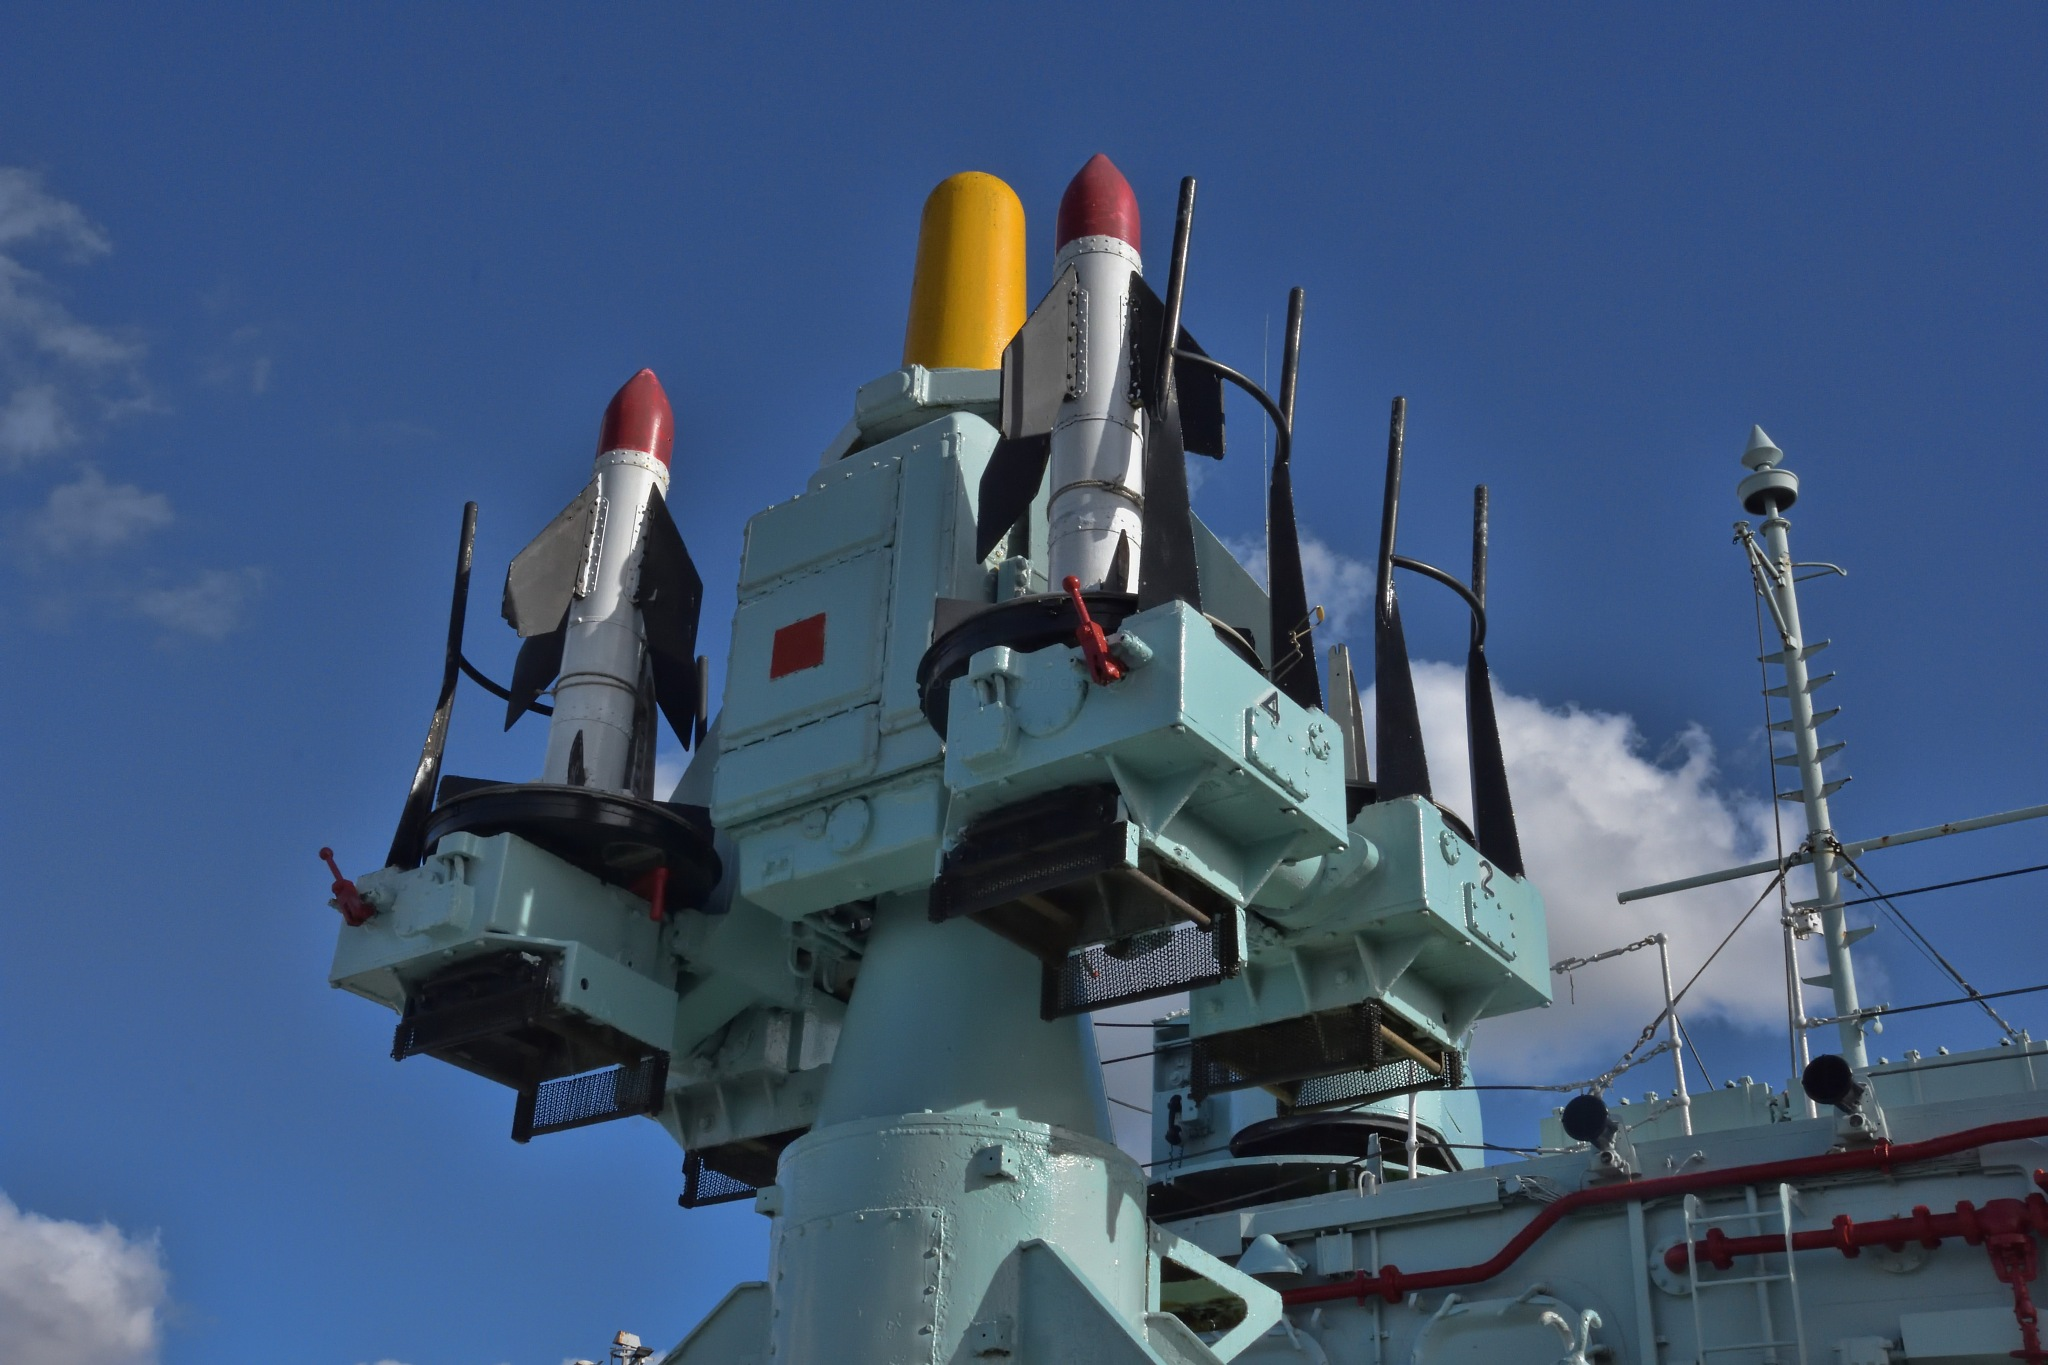 HMS Cavalier by Derek Clarke